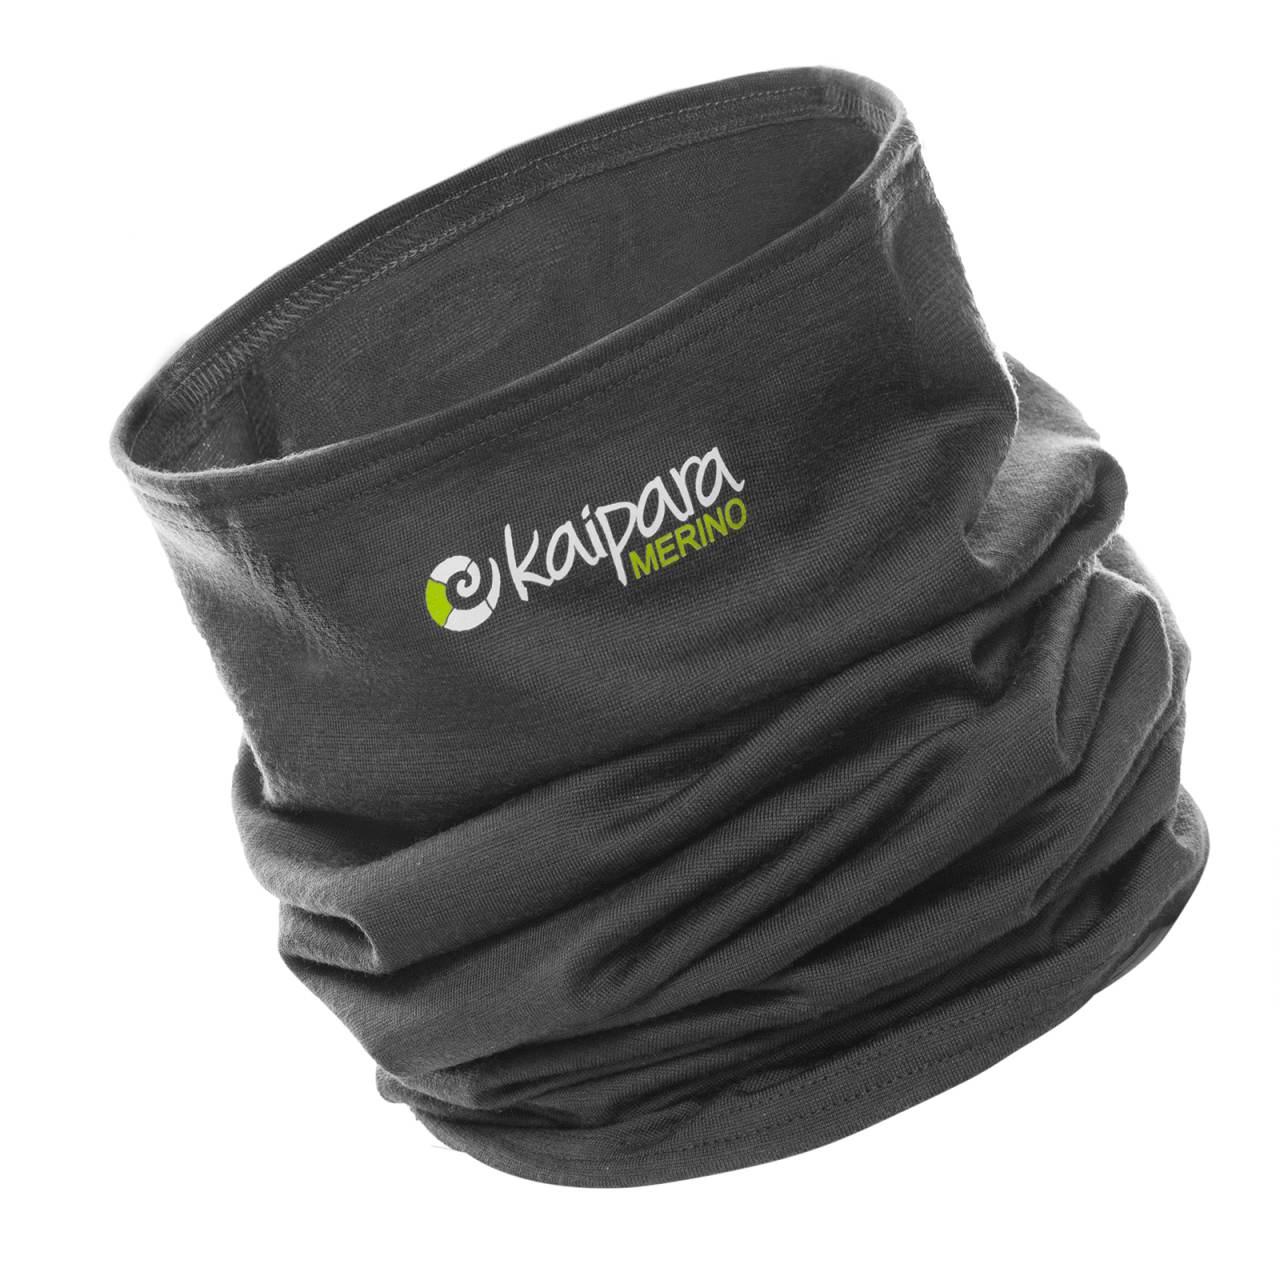 Merino Schal Unisex 200